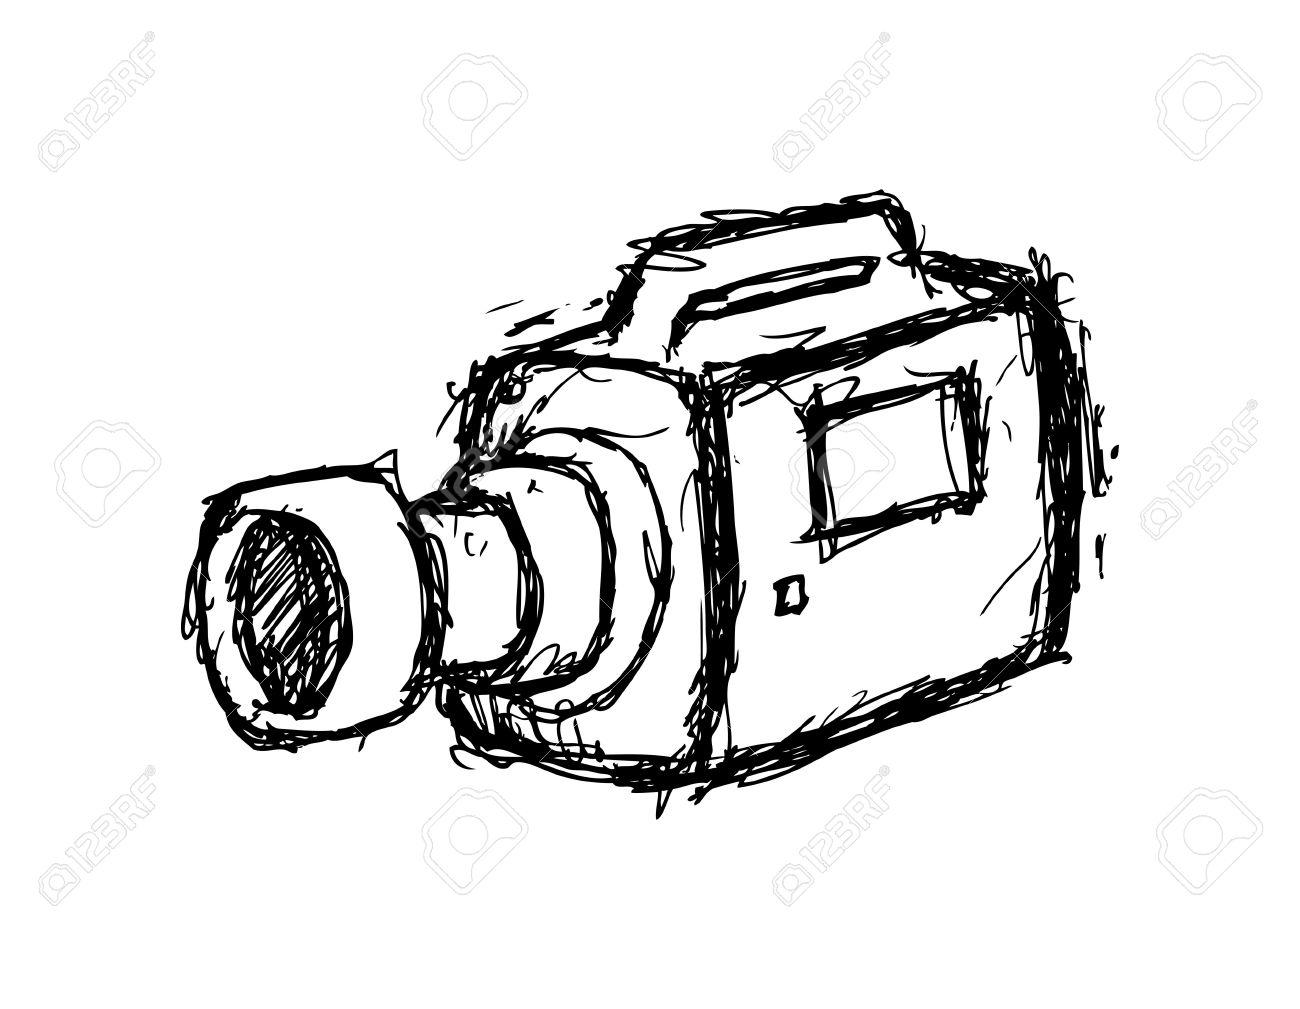 1300x1009 Hand Drawn Video Camera Royalty Free Cliparts, Vectors, And Stock